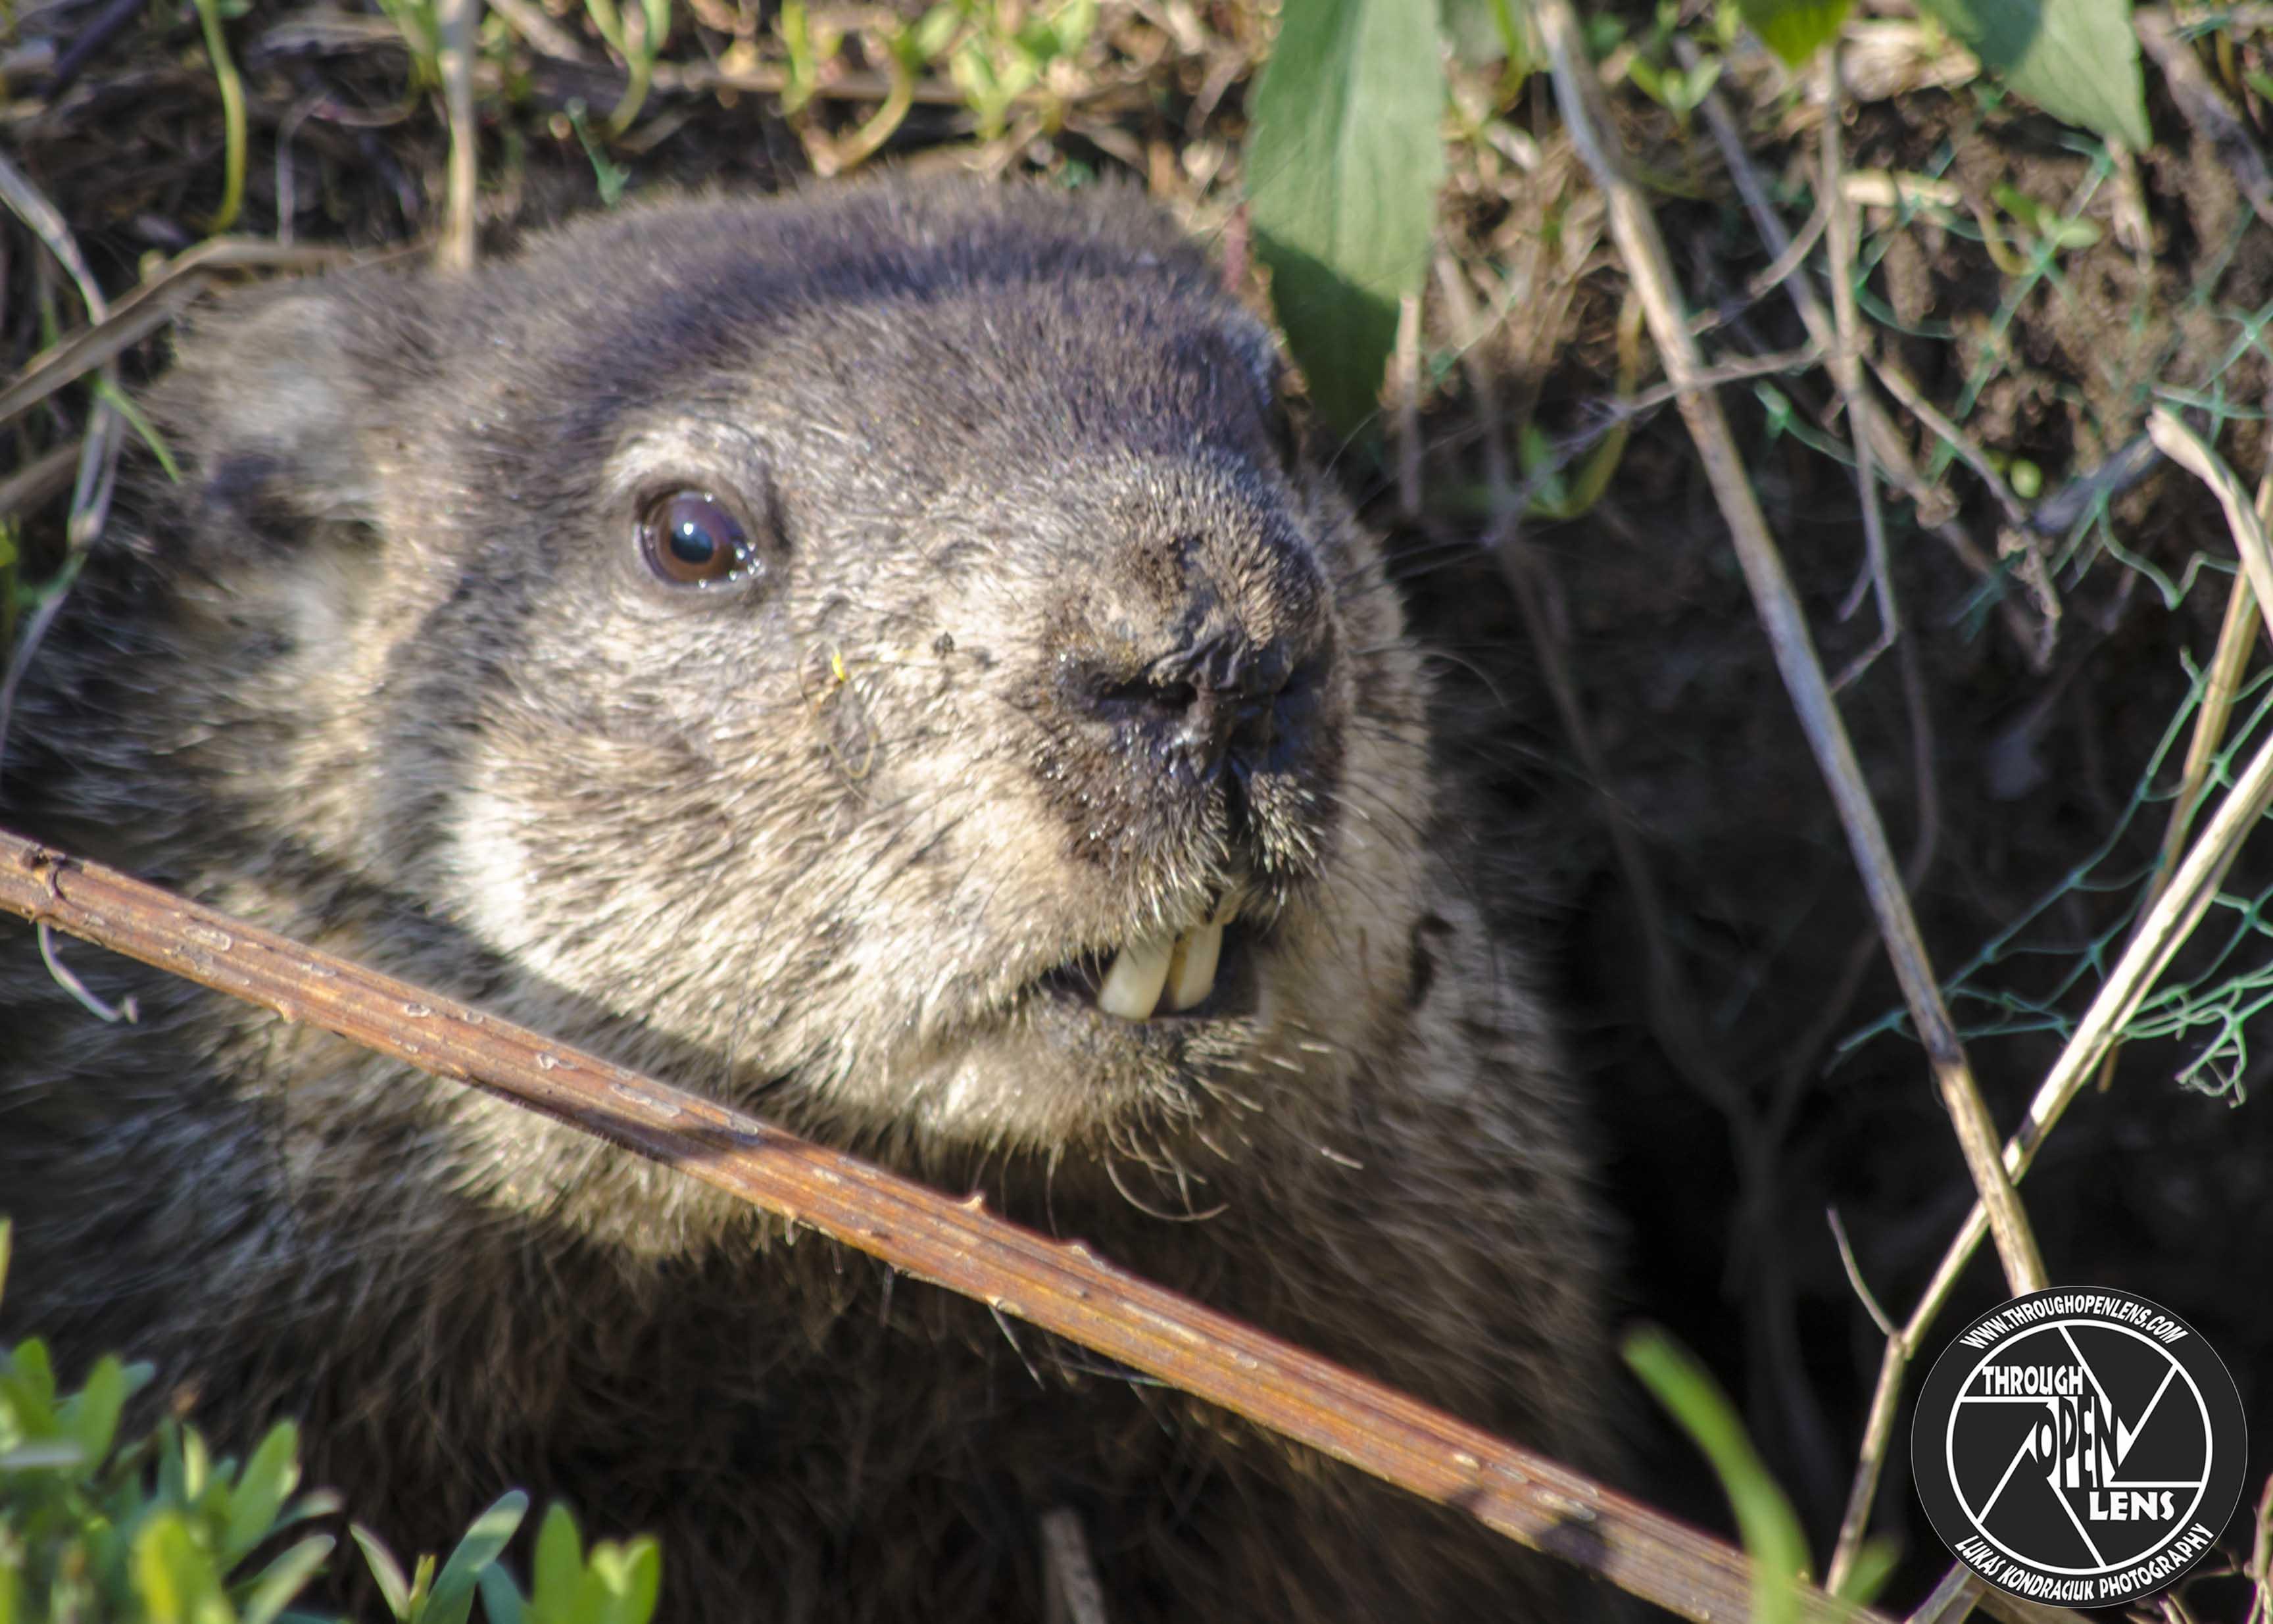 groundhog u2013 through open lens